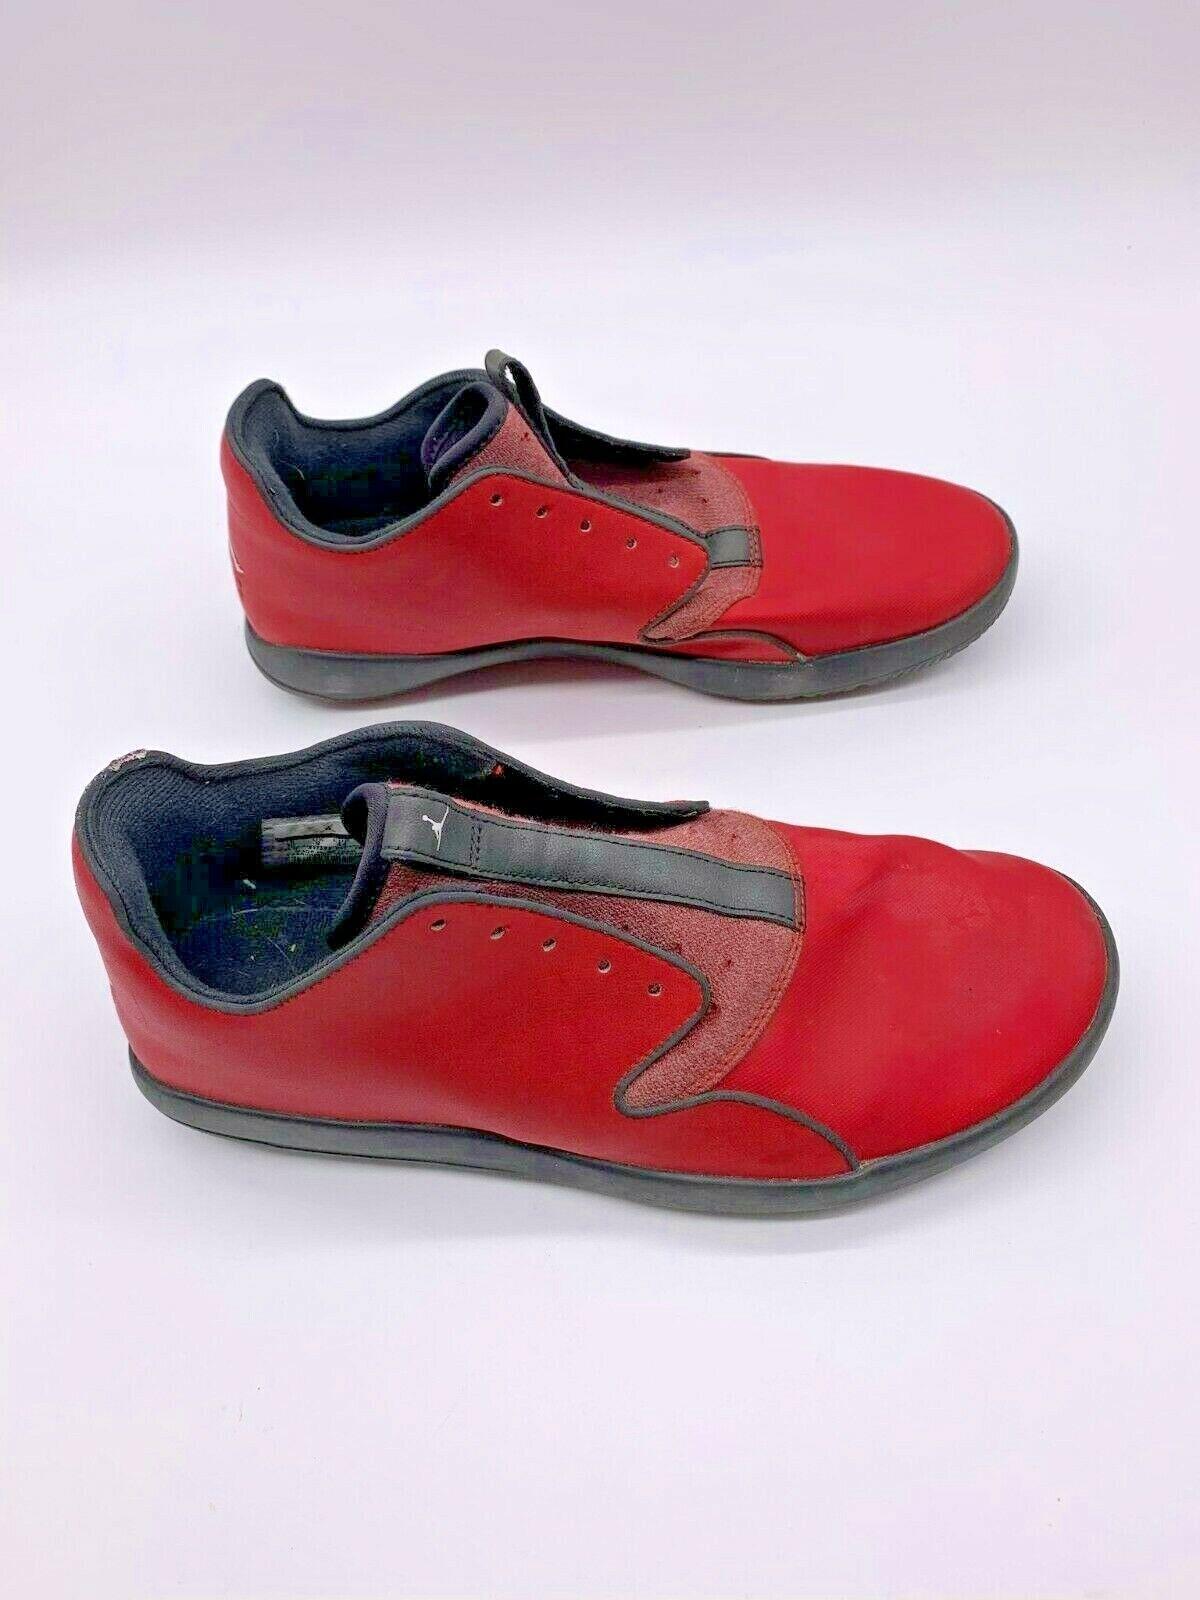 Nike Air Jordan Eclipse Men's sz 10 812303-601 low top red leather NO STRINGS!